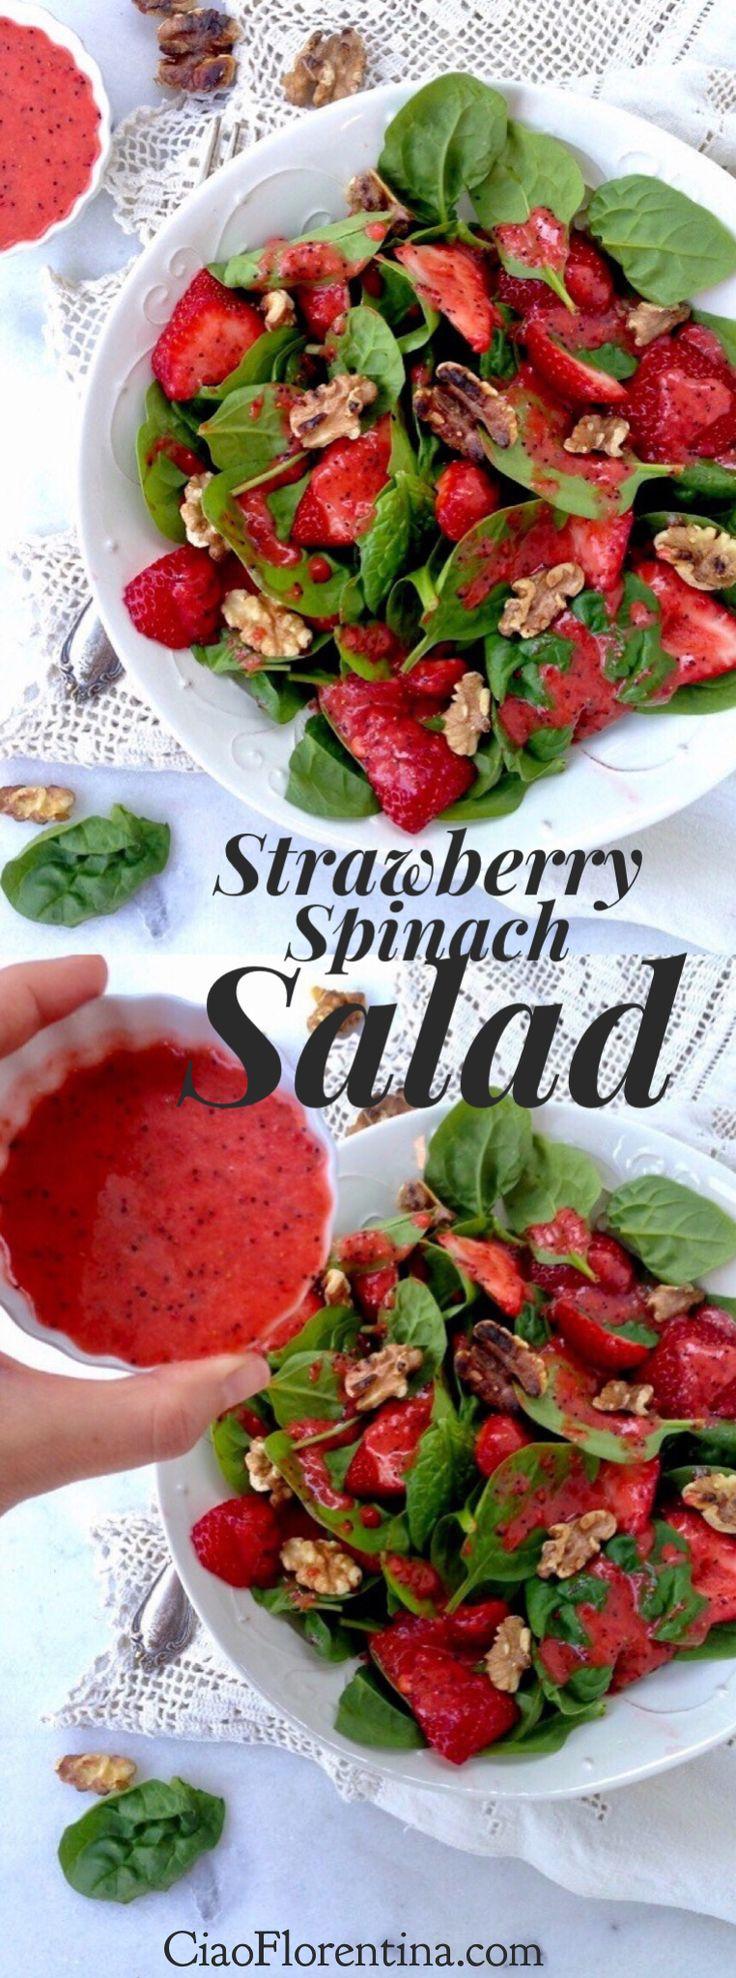 Strawberry Spinach Salad Recipe with Lemon Poppyseed Dressing |   | CiaoFlorentina.com @CiaoFlorentina